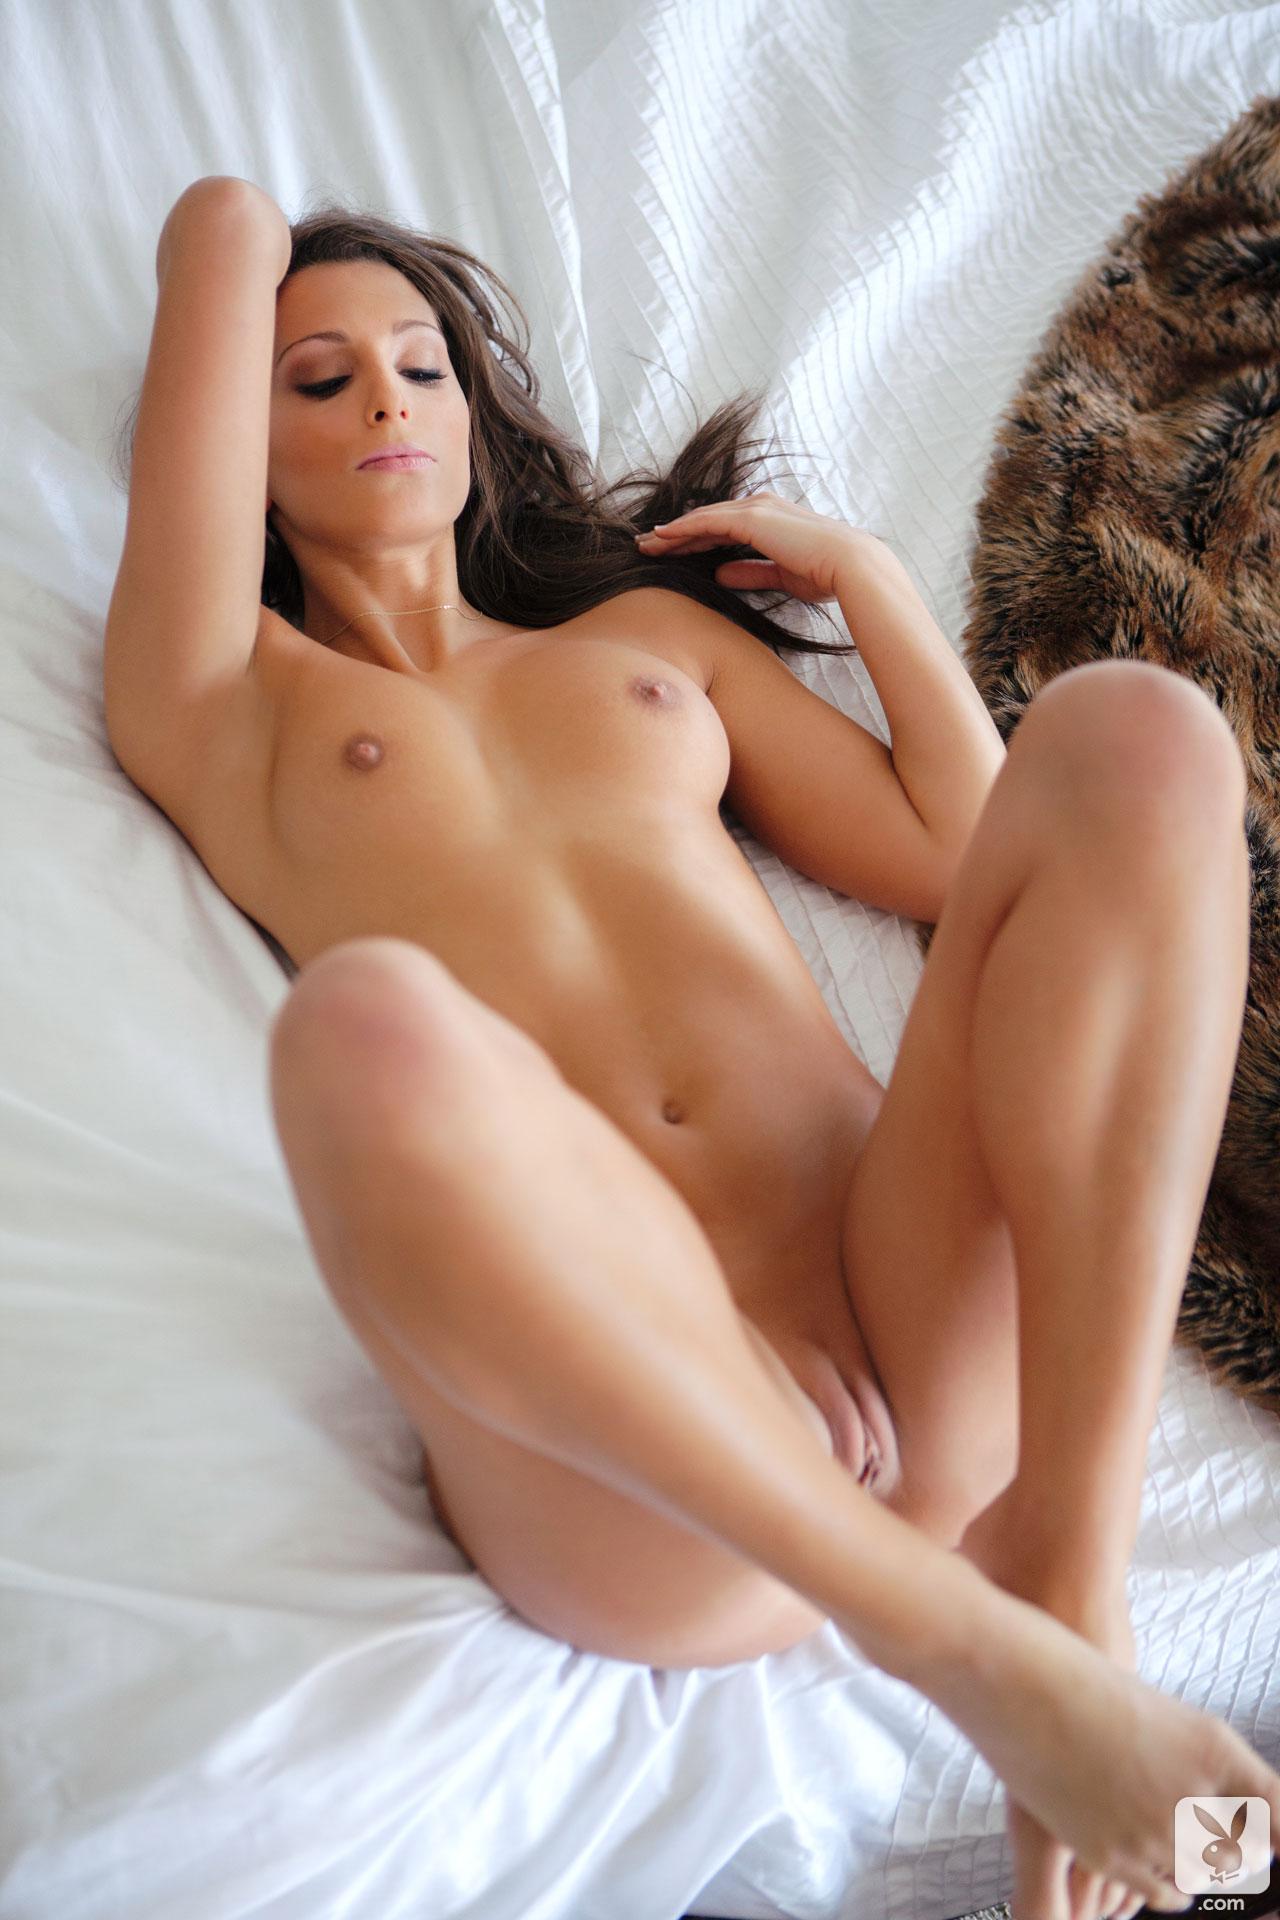 topless playmates tumblr